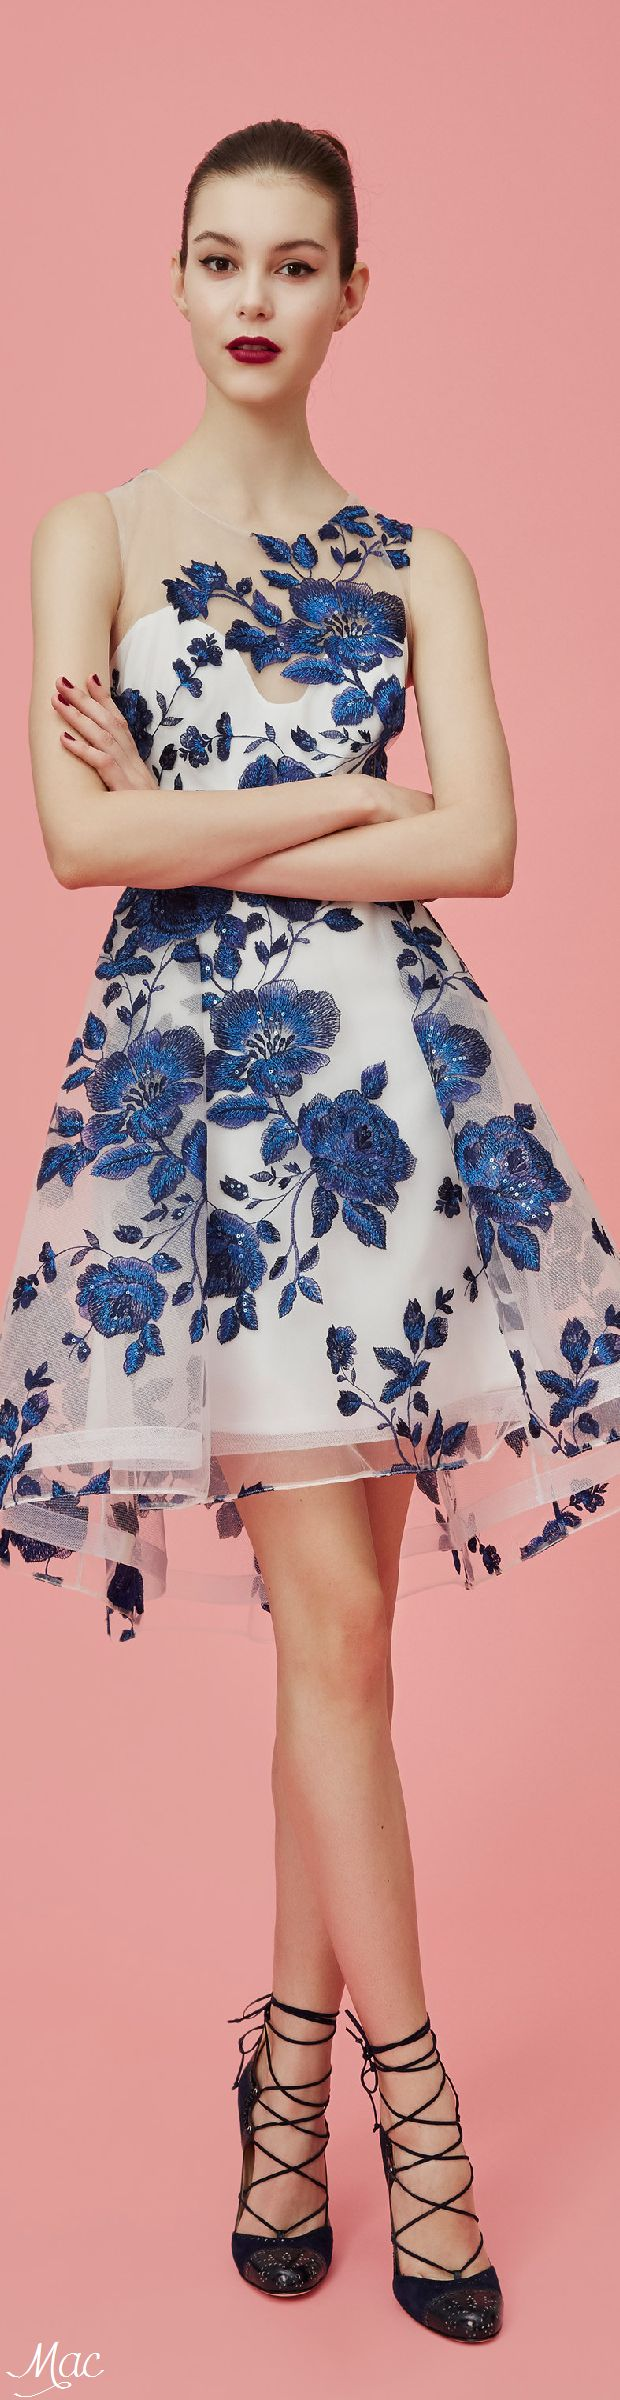 1458 best Feminine Fashion images on Pinterest | Woman fashion, Cute ...